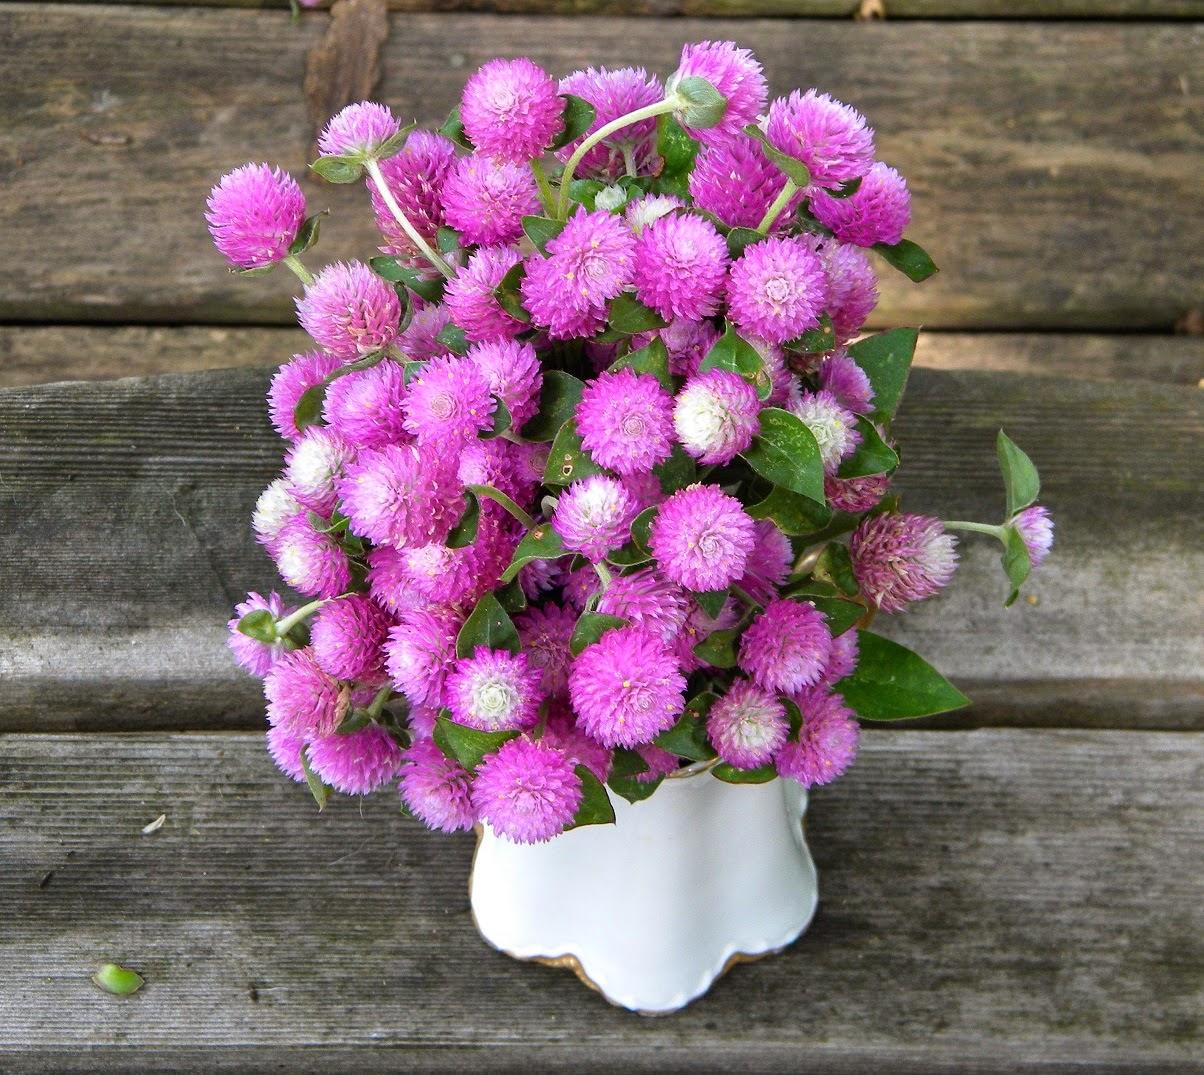 Wedding Flowers In February: Wedding Flowers From Springwell: February 2015